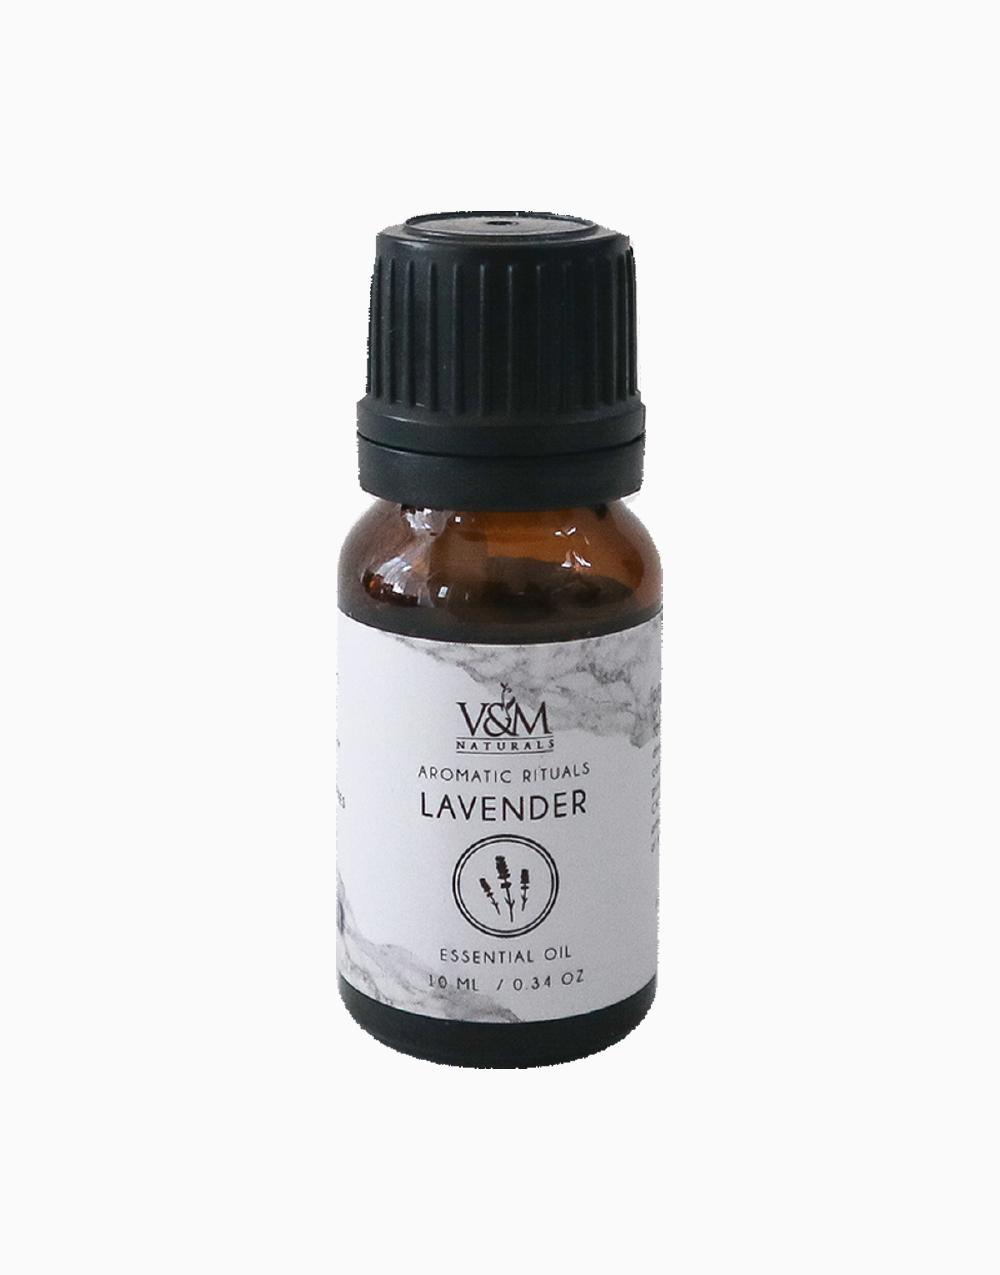 Lavender Essential Oil by V&M Naturals